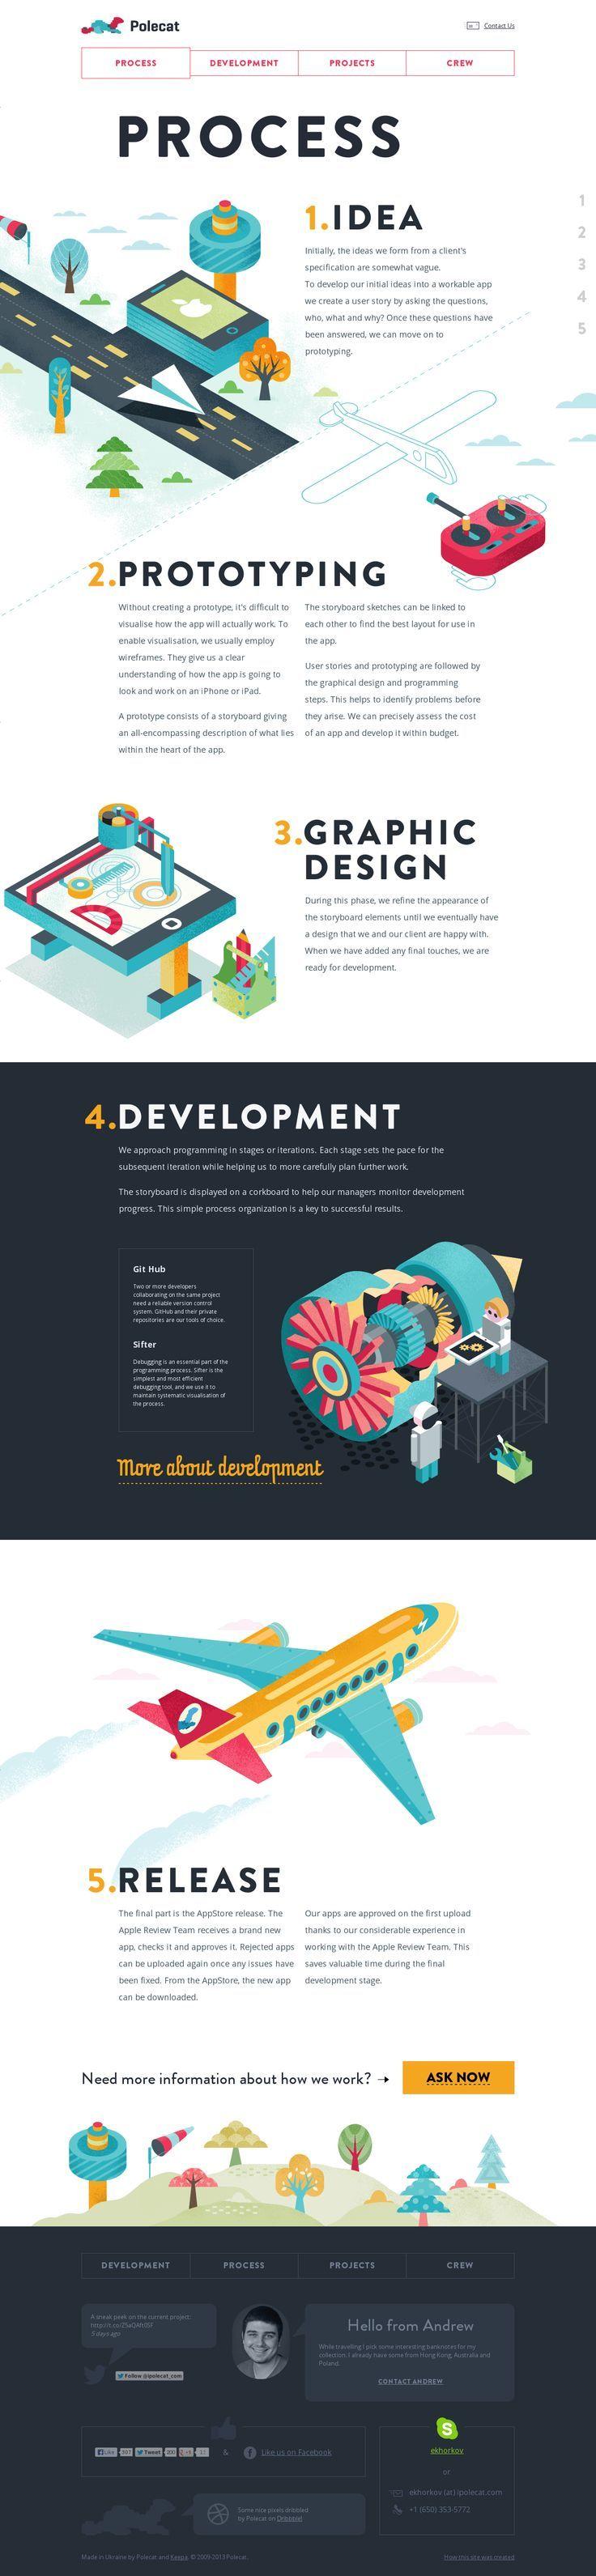 """We make iPhone & iPad apps"" #flatdesign:"